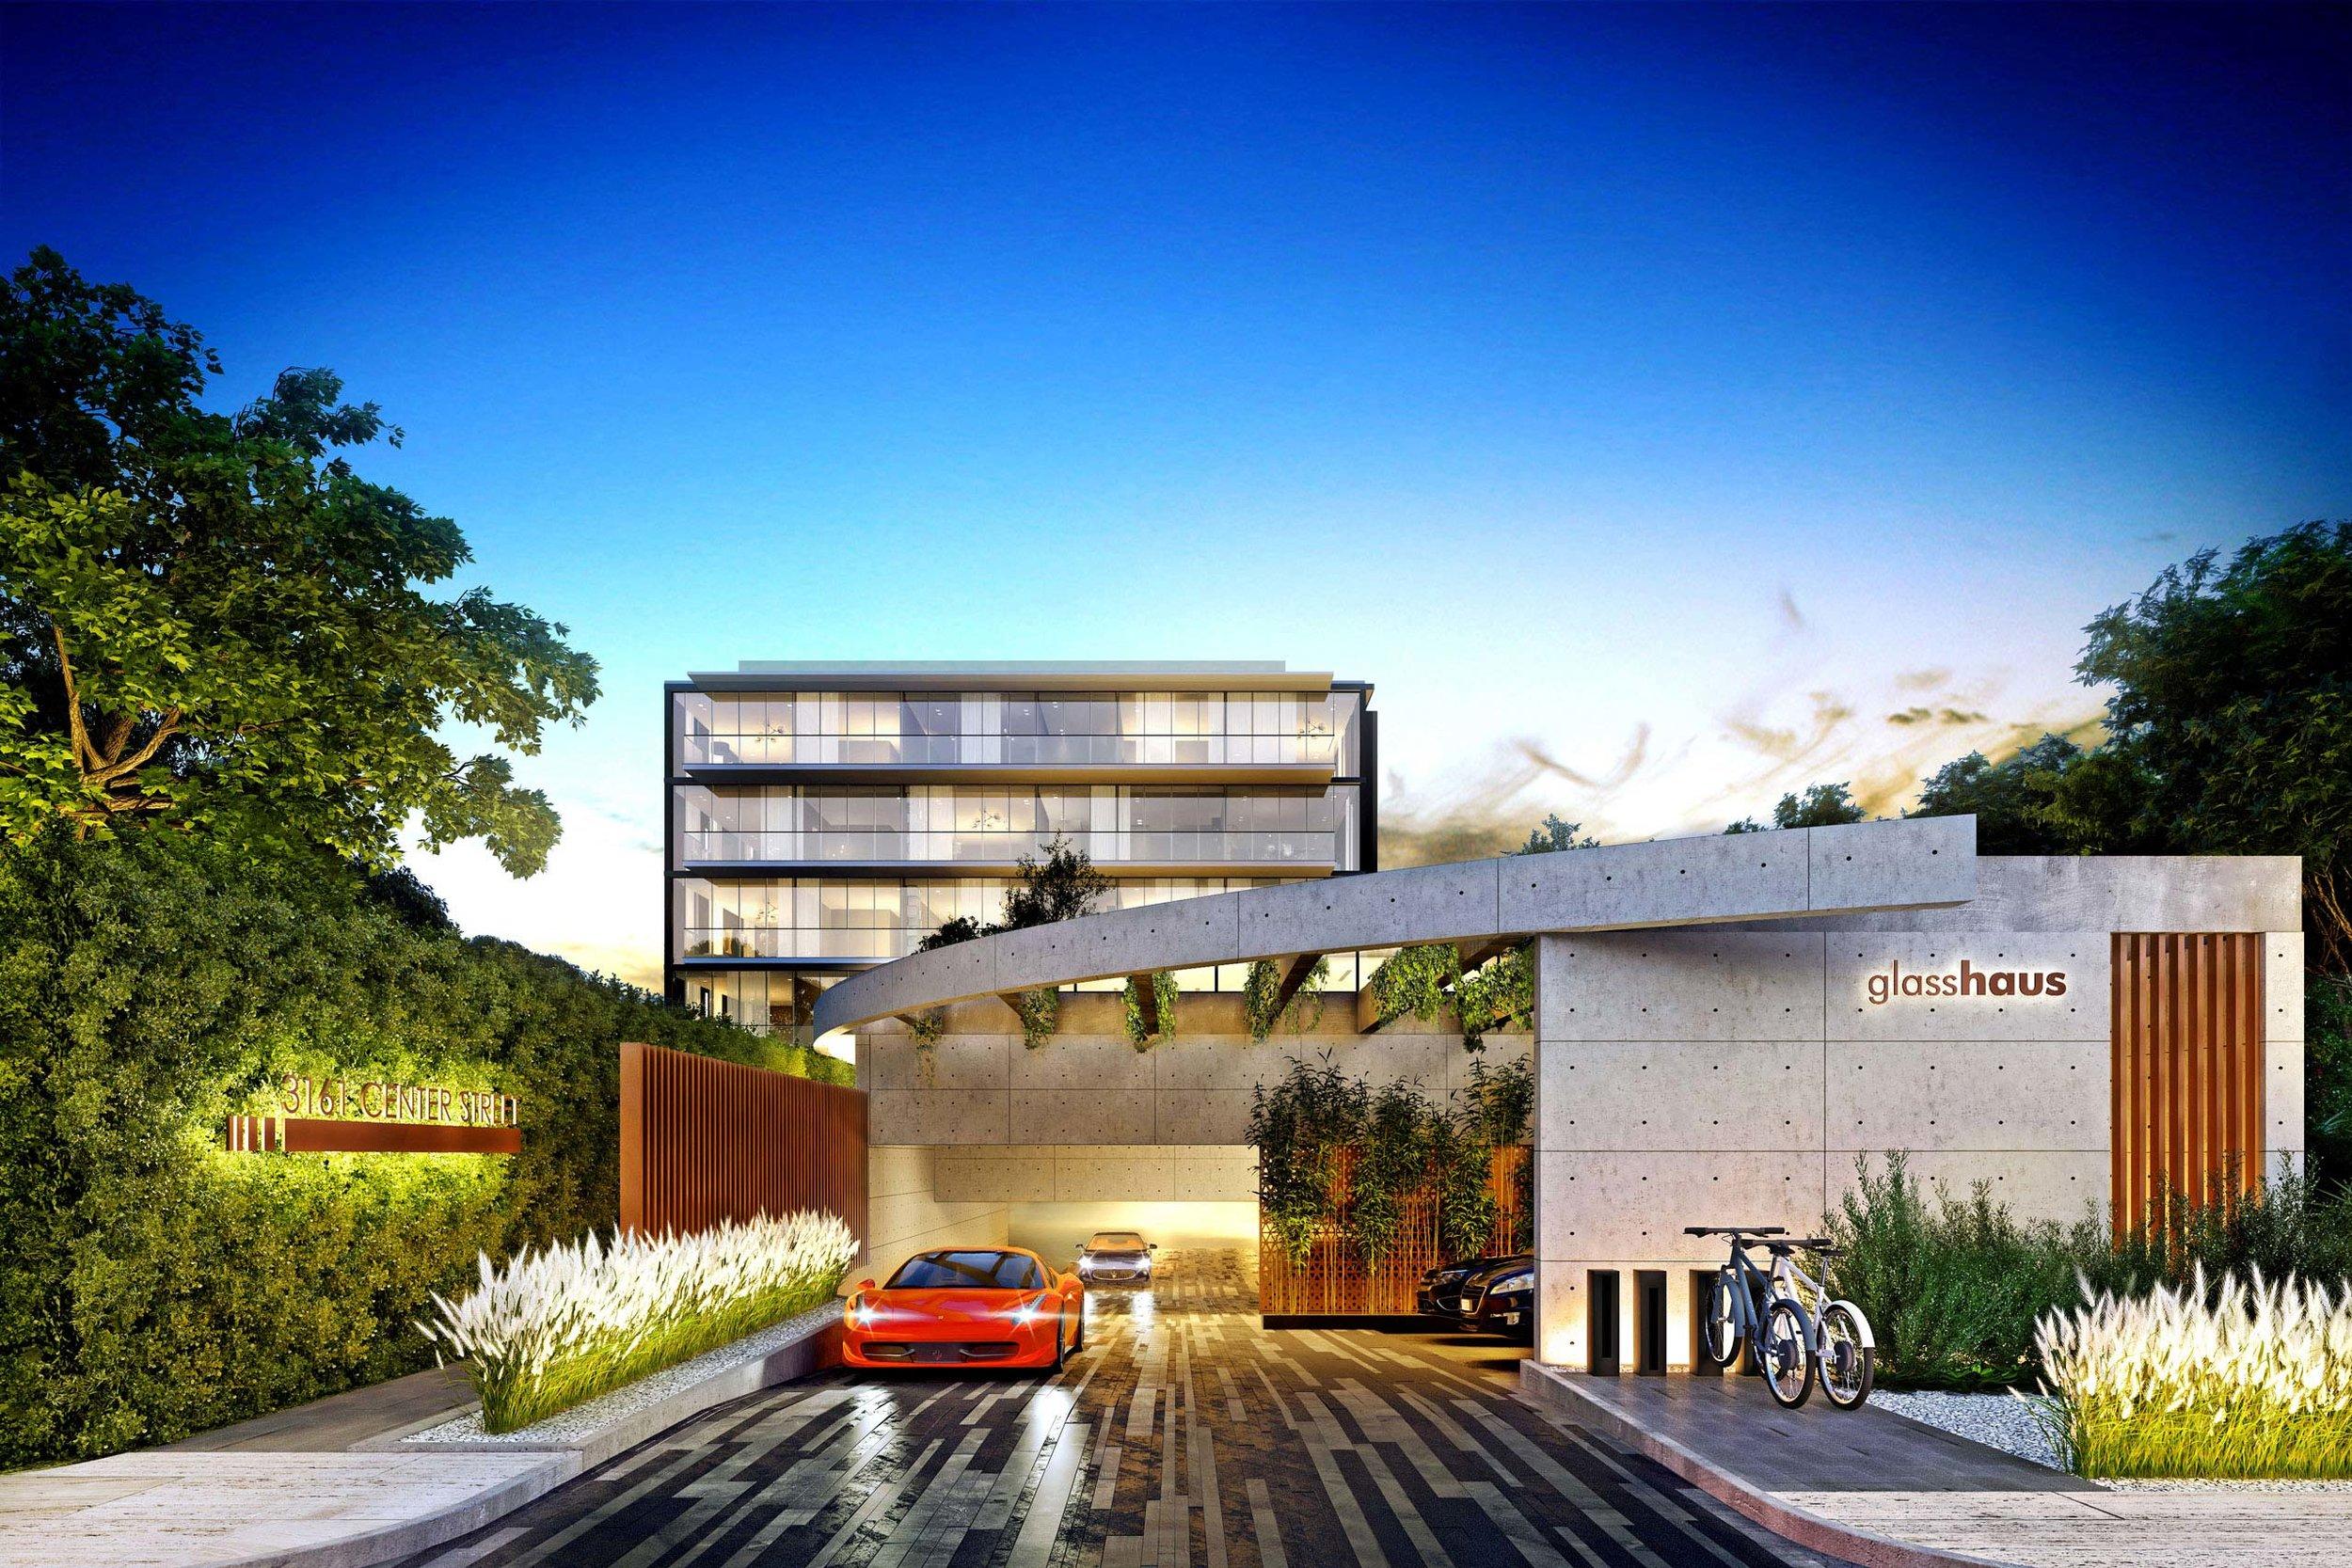 glasshaus-center-street-view.jpg